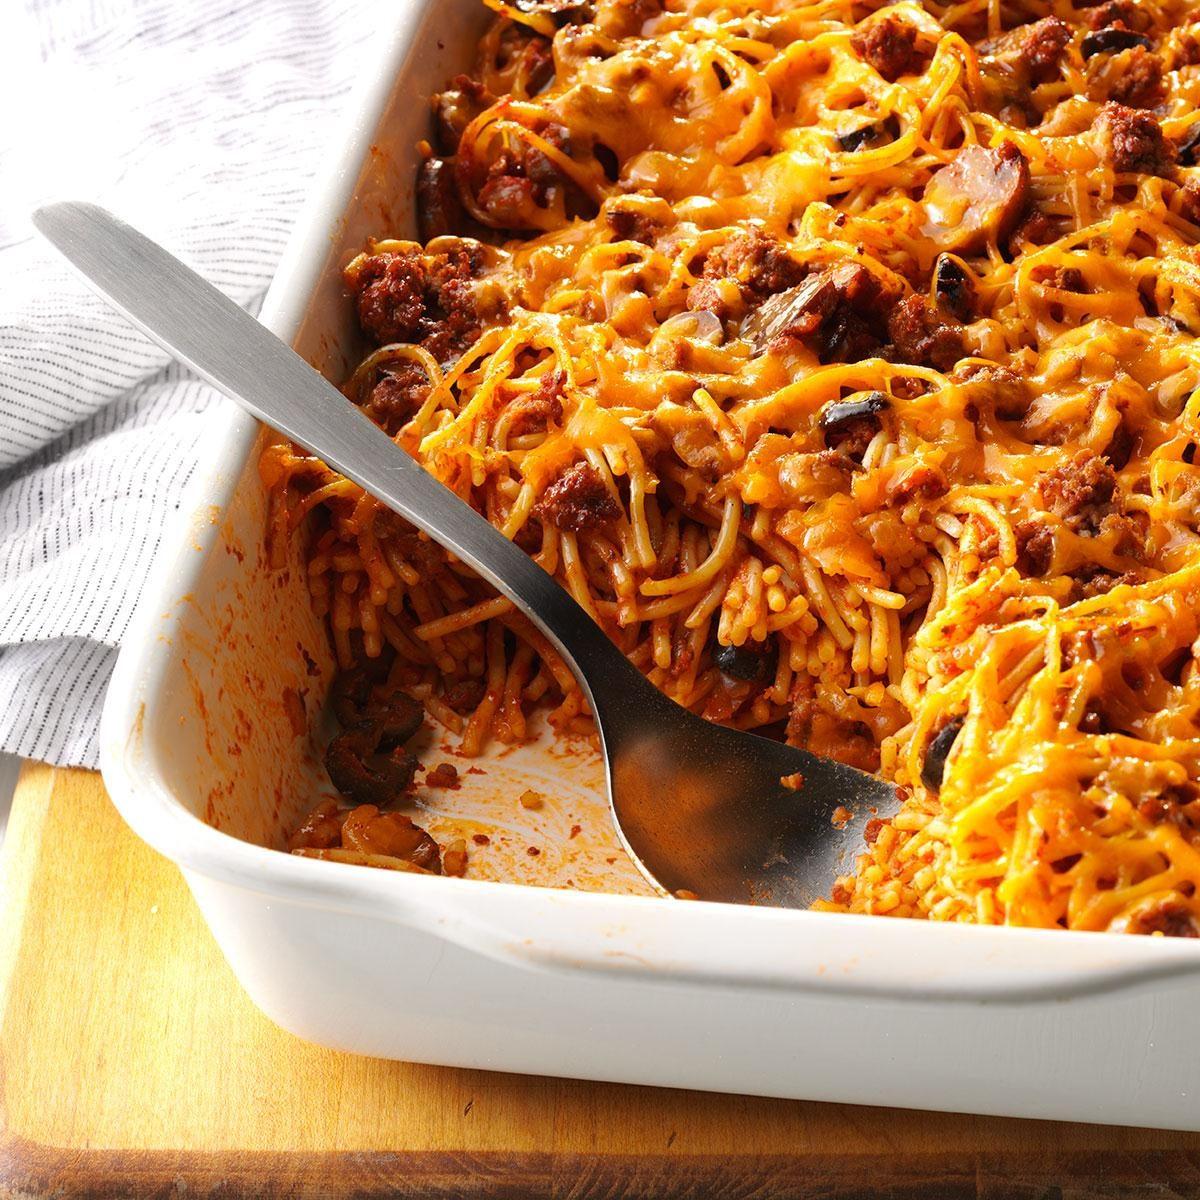 Southwestern Spaghetti Casserole